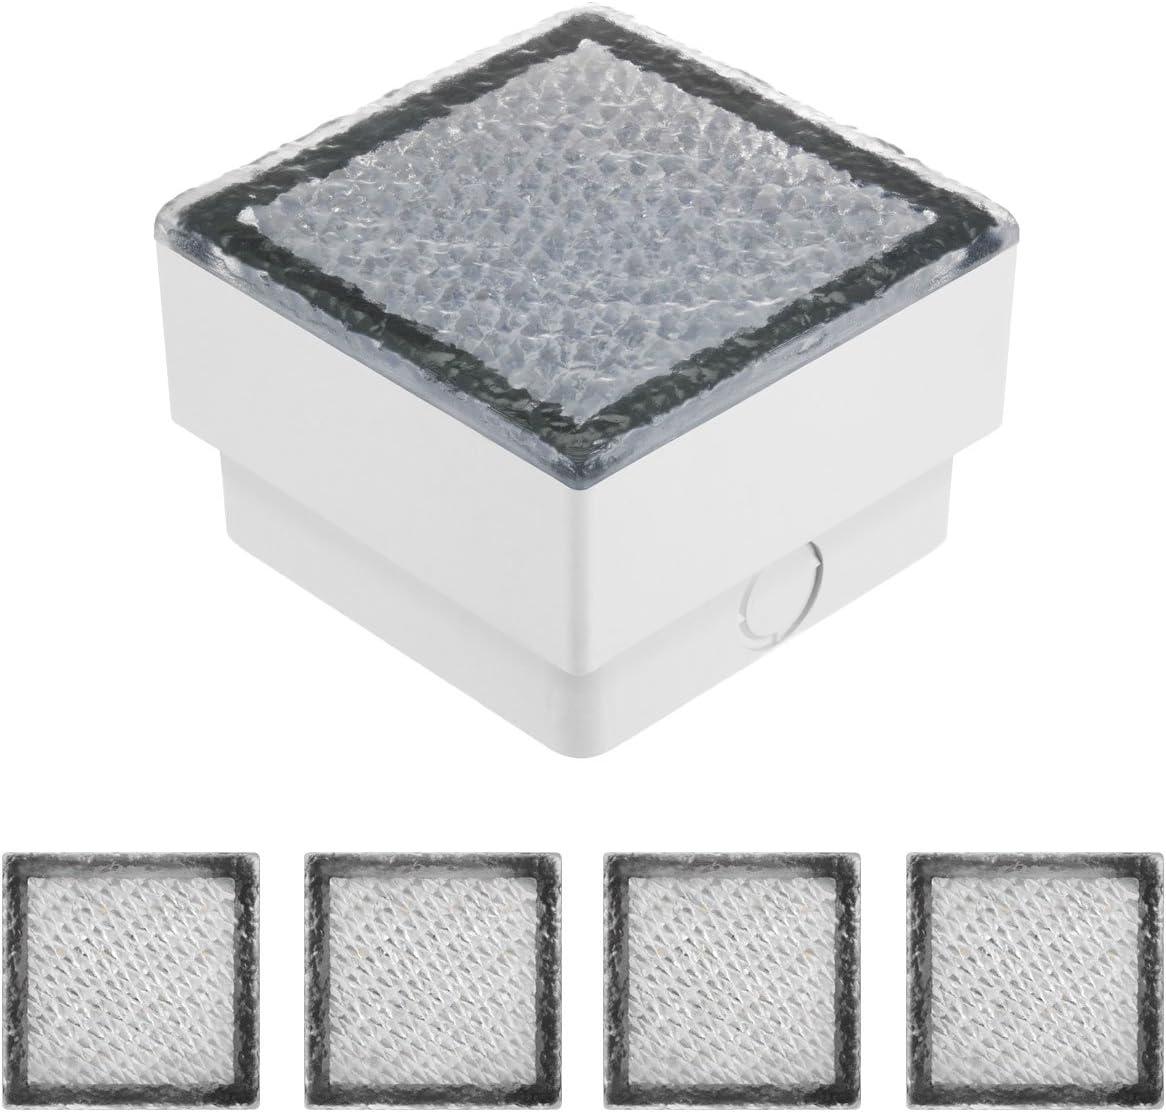 5er Pack Parlat LED Pflasterstein Bodenleuchte CUS 10x10cm 230V warm-wei/ß